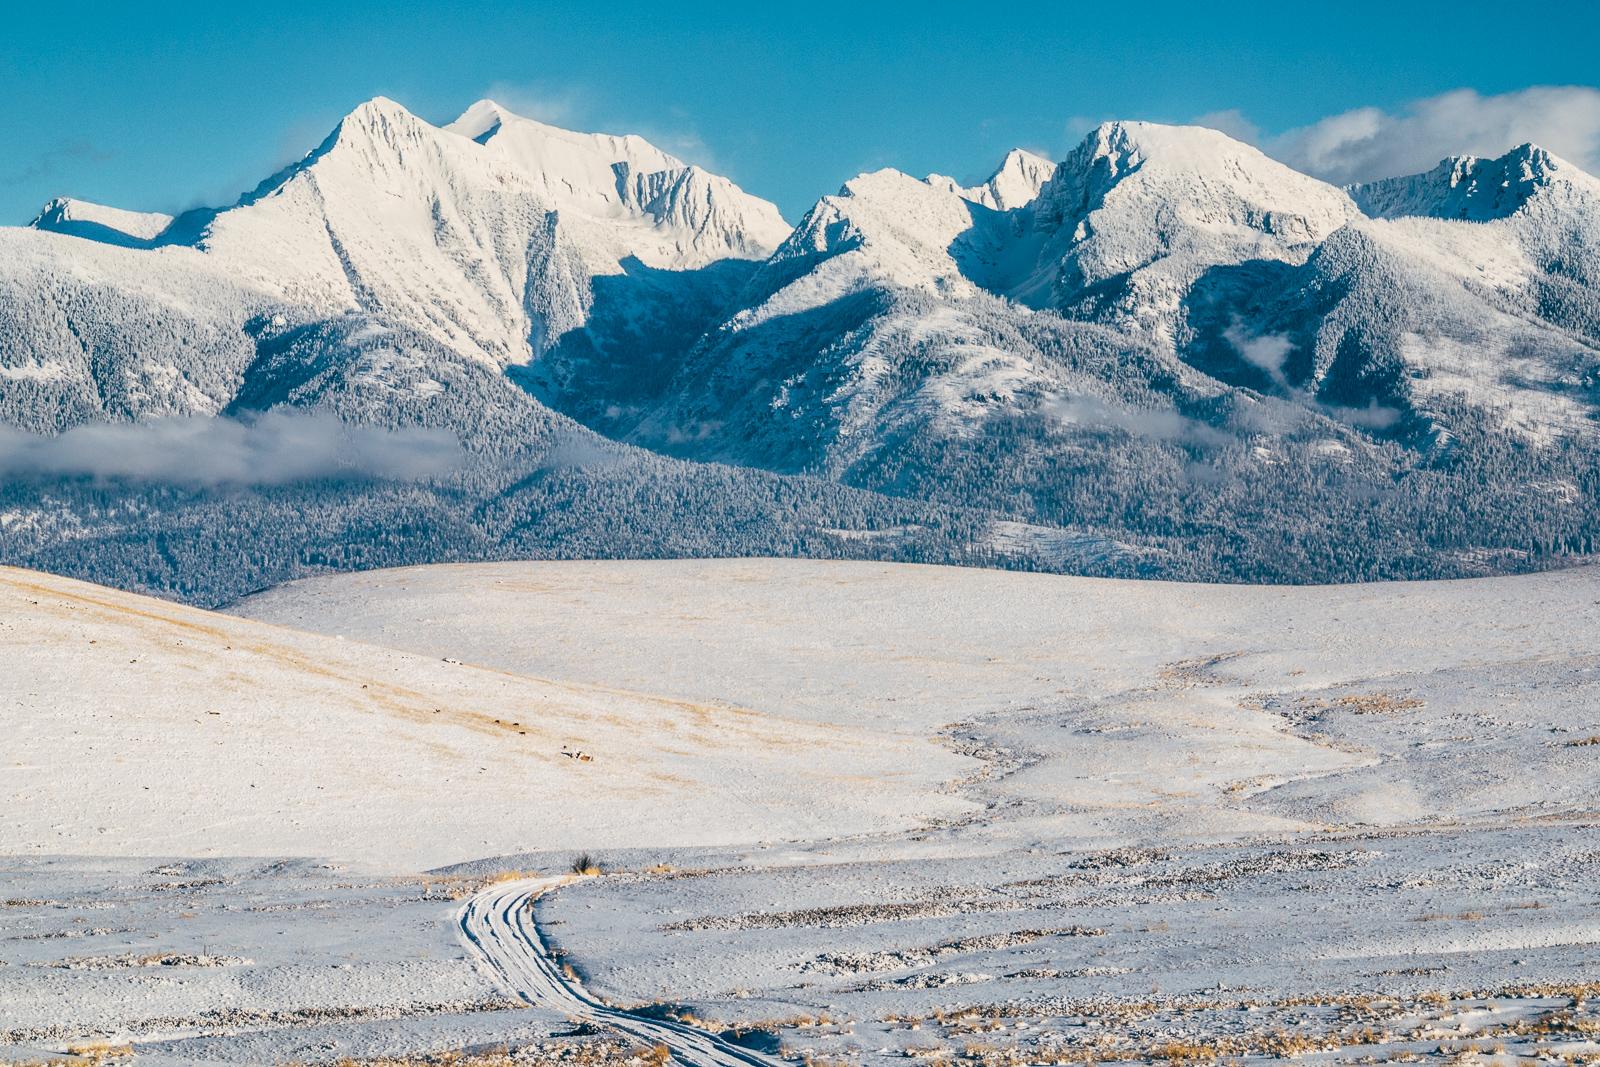 Mission Majesty    -  Mission Mountains, MT